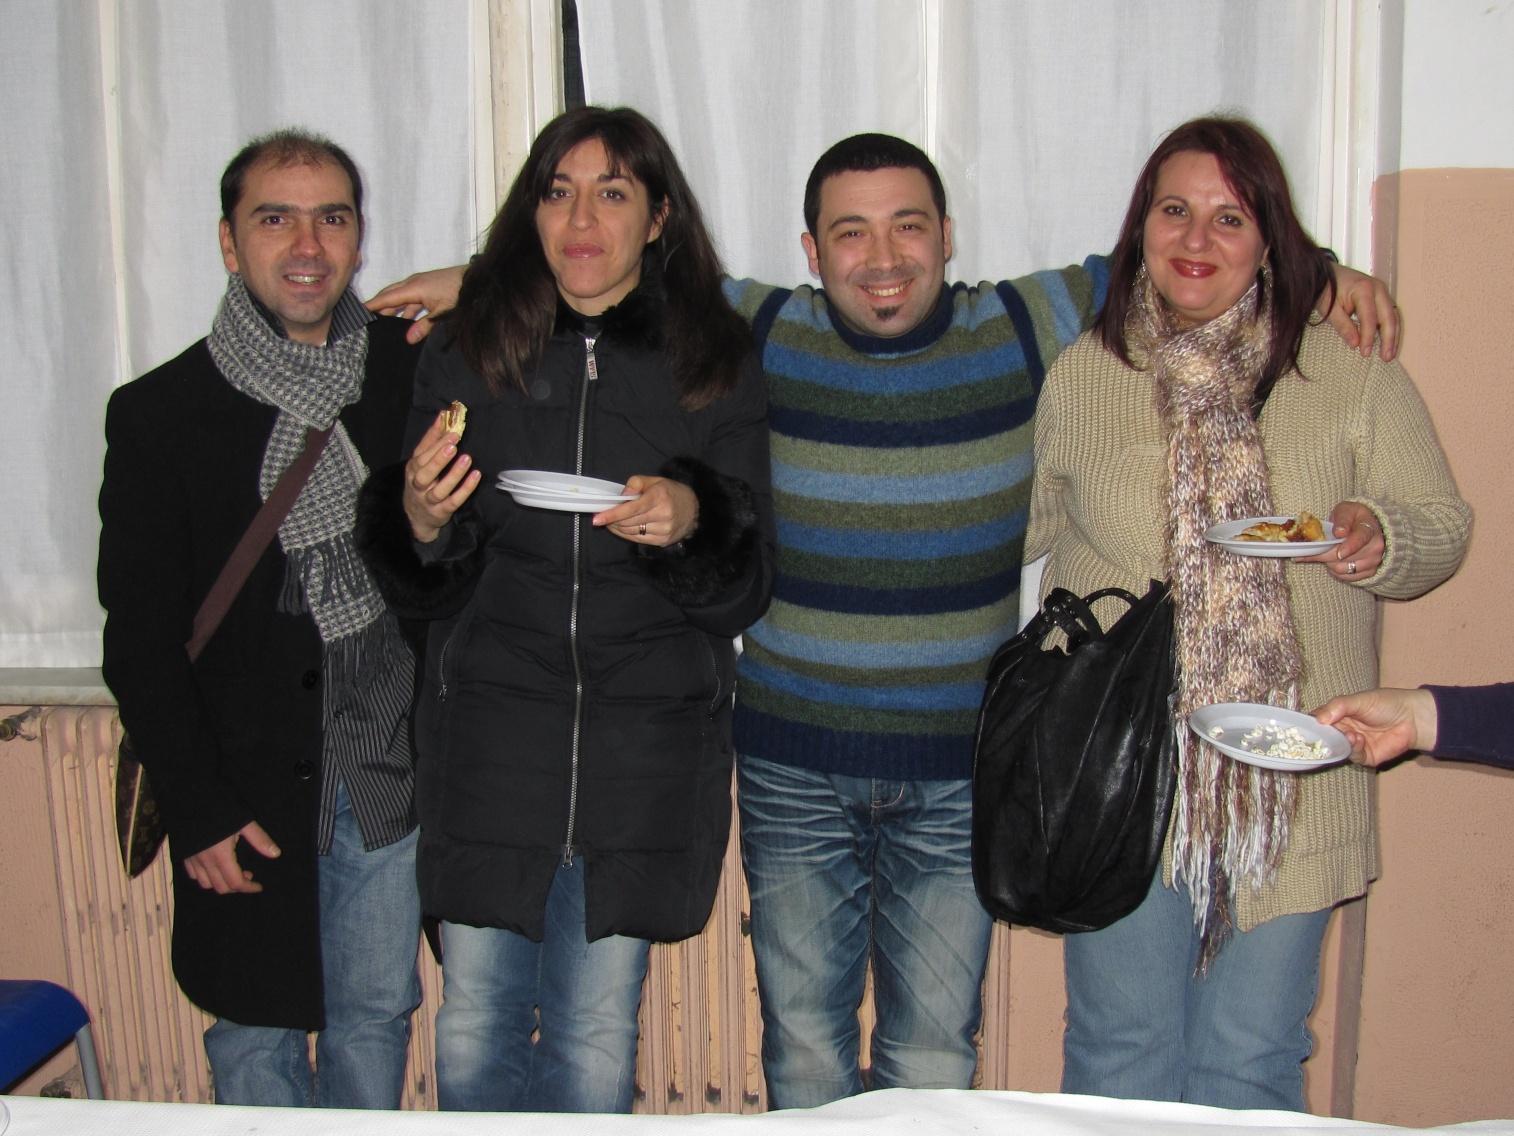 ricordo_battesimo_gesu_2011-01-23-16-52-49